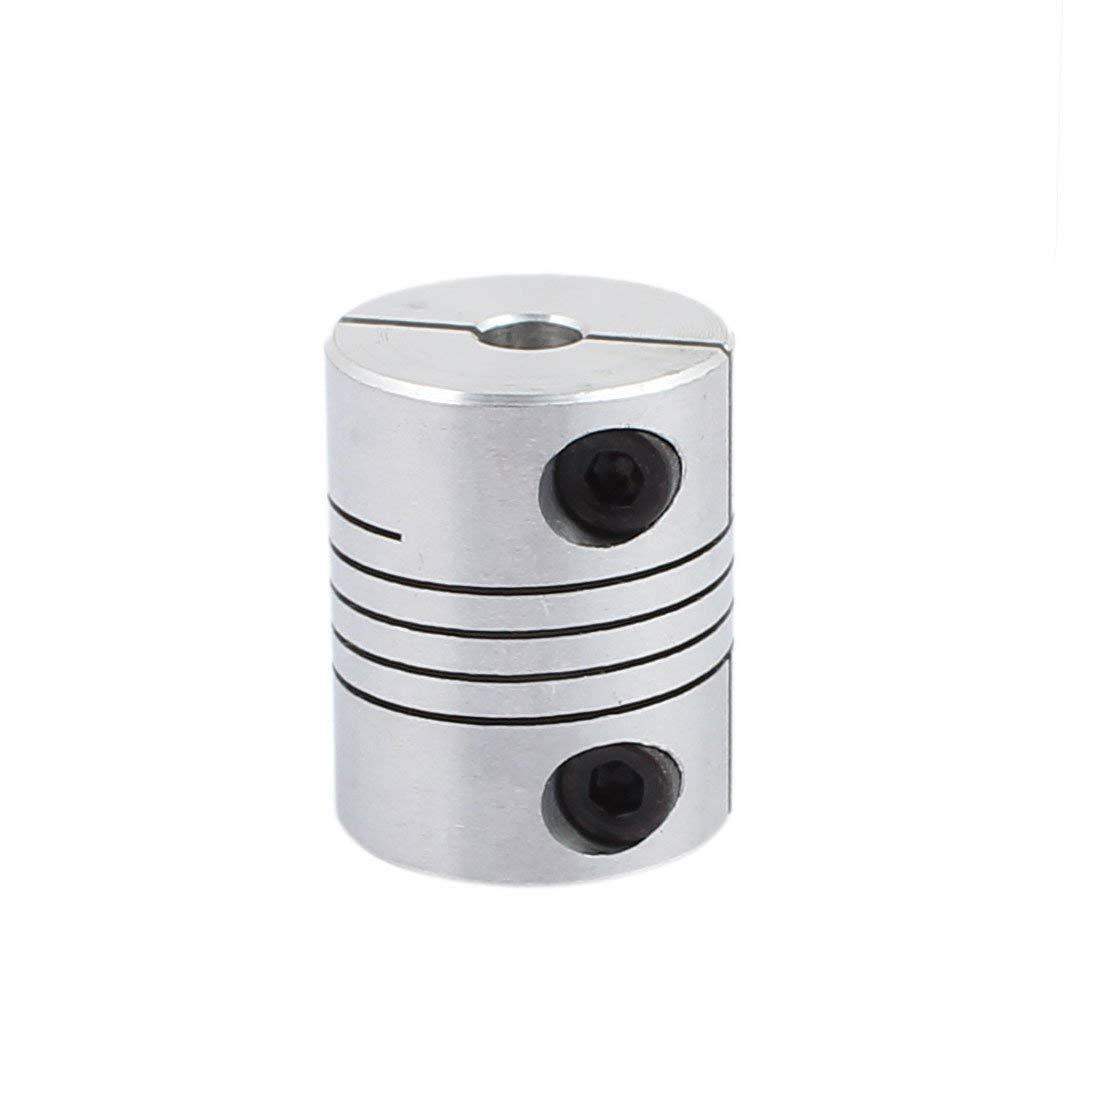 Xnrtop 5mm to 6mm Shaft Coupling 25mm Length 20mm Diameter Stepper Motor Coupler Aluminum Alloy Joint Connector for 3D Printer CNC Machine DIY Encoder Pack of 2)